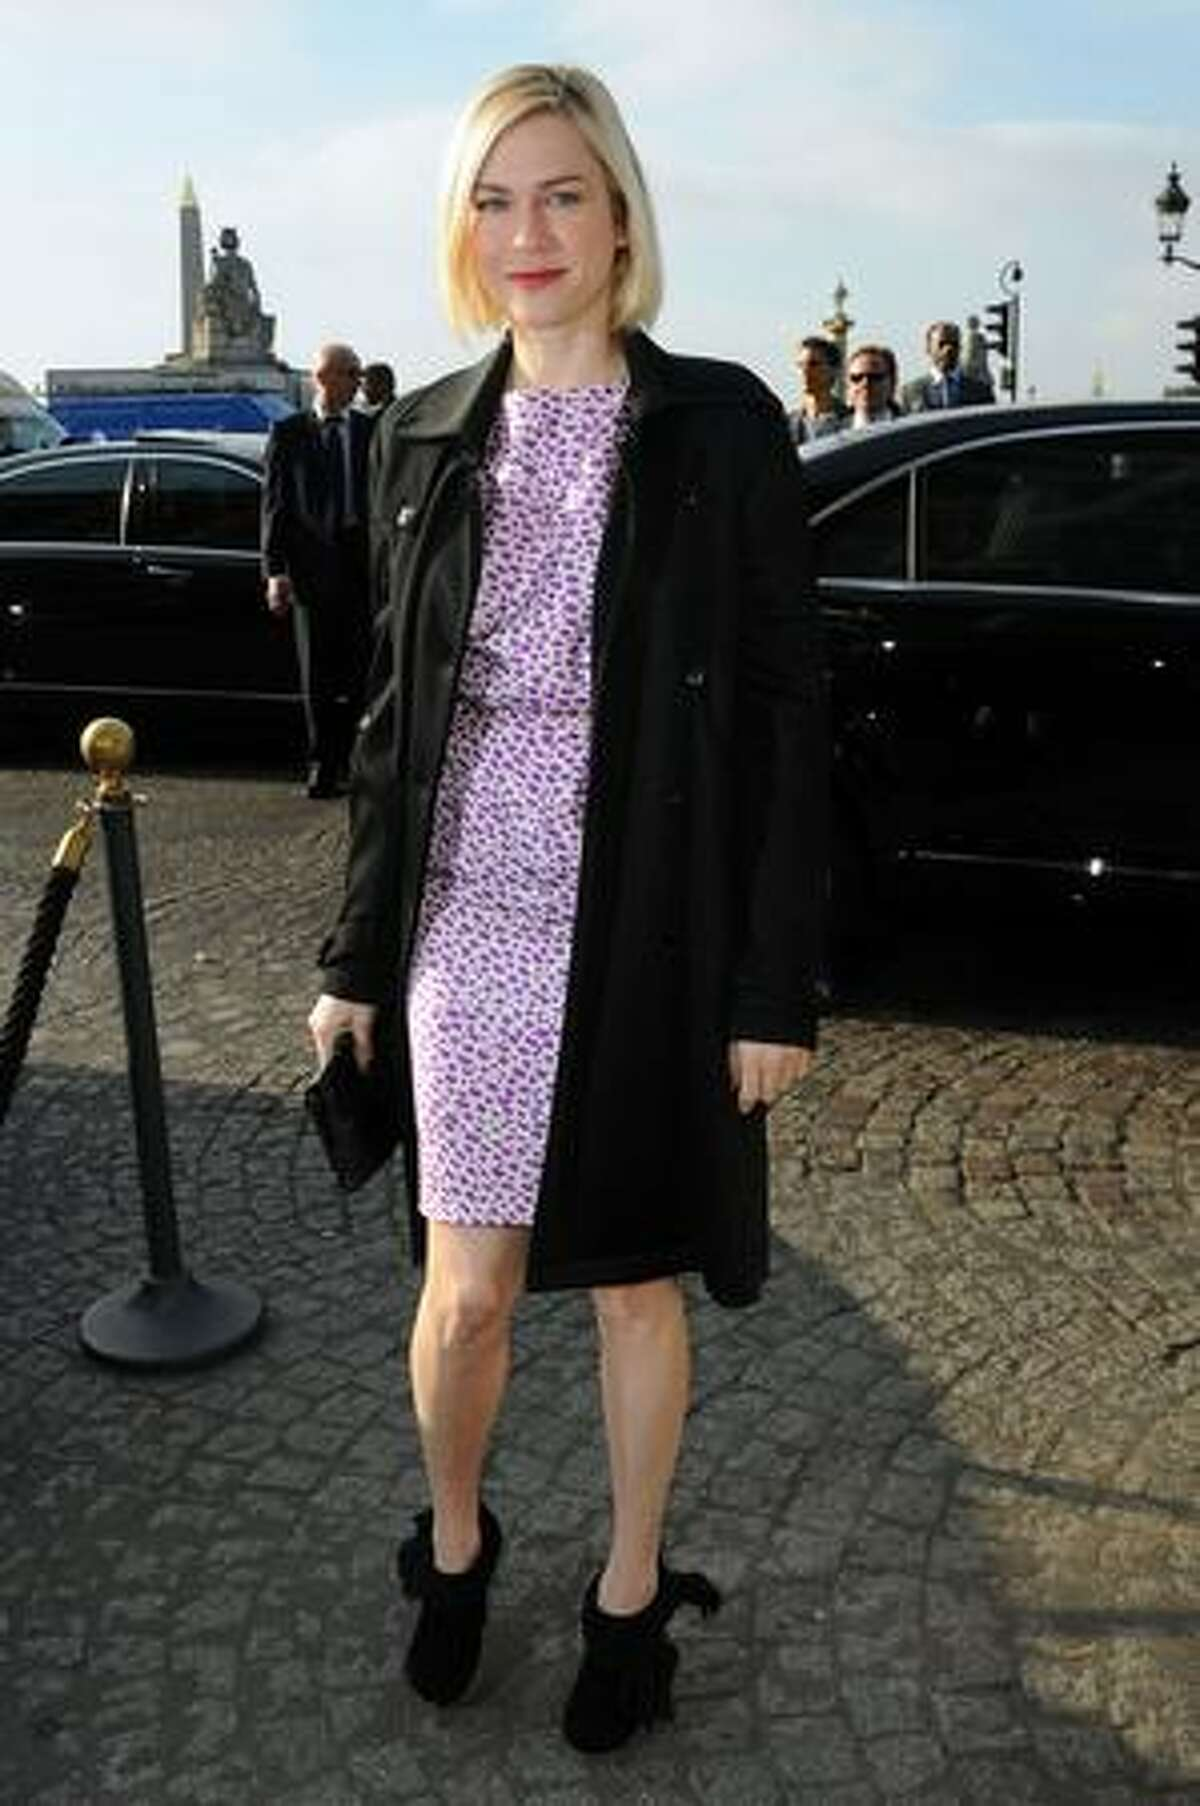 Actress Marie-Josee Croze attends a runway show as part of Paris Fashion Week spring/summer 2010 in Paris.